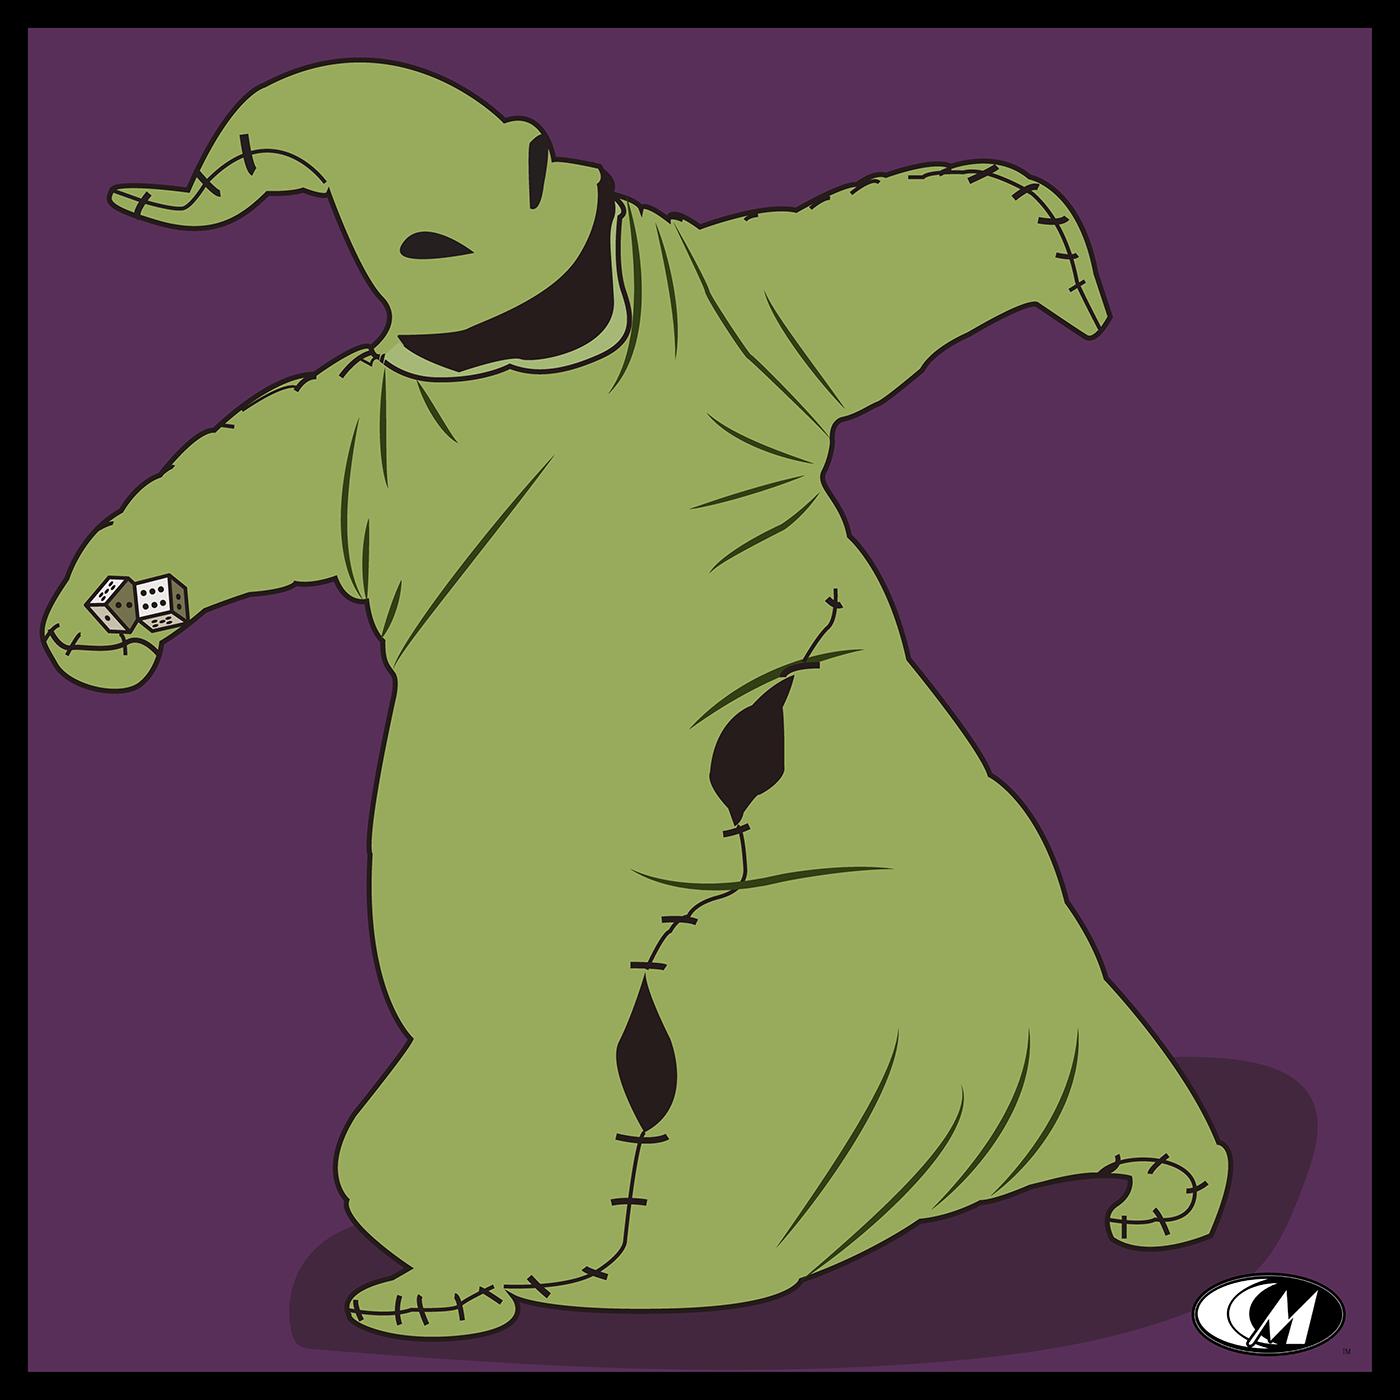 ILLUSTRATION  Digital Art  cartoon nightmare before christmas Halloween Boggie man Classic horror Scary stitches